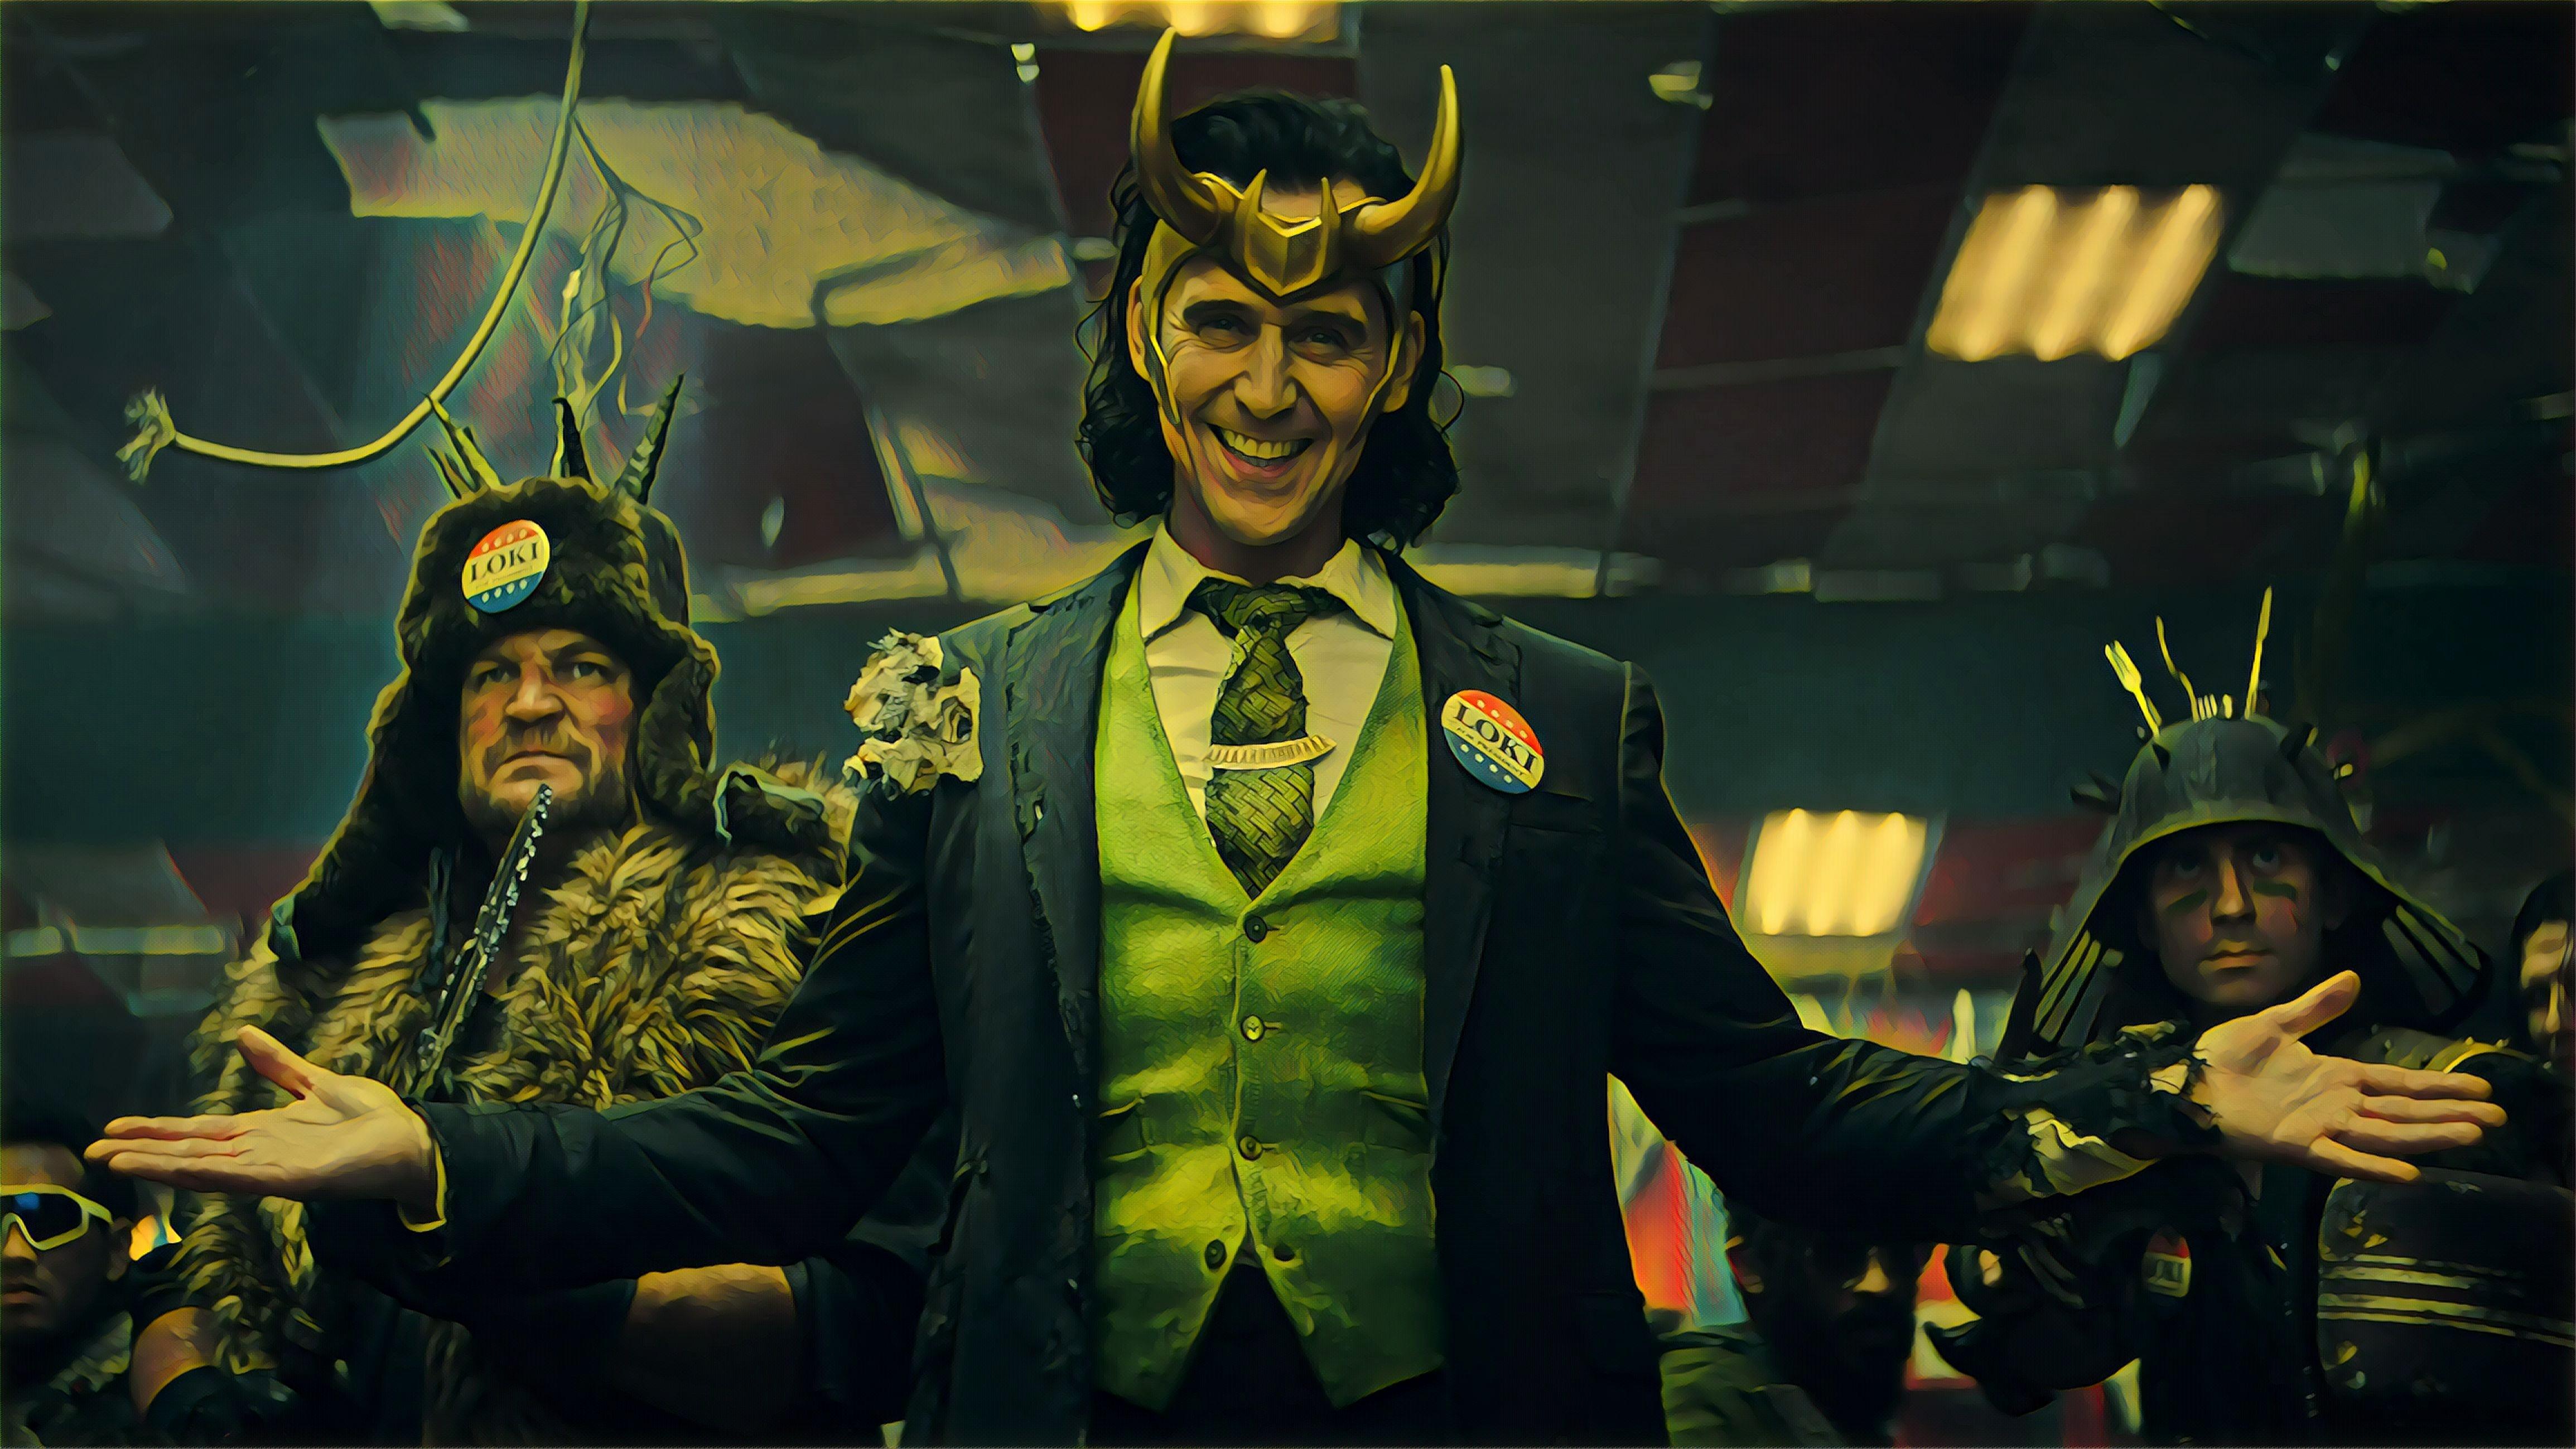 Updated New gallery of Loki 2021 UHD 4K screencaps Movie 4618x2598